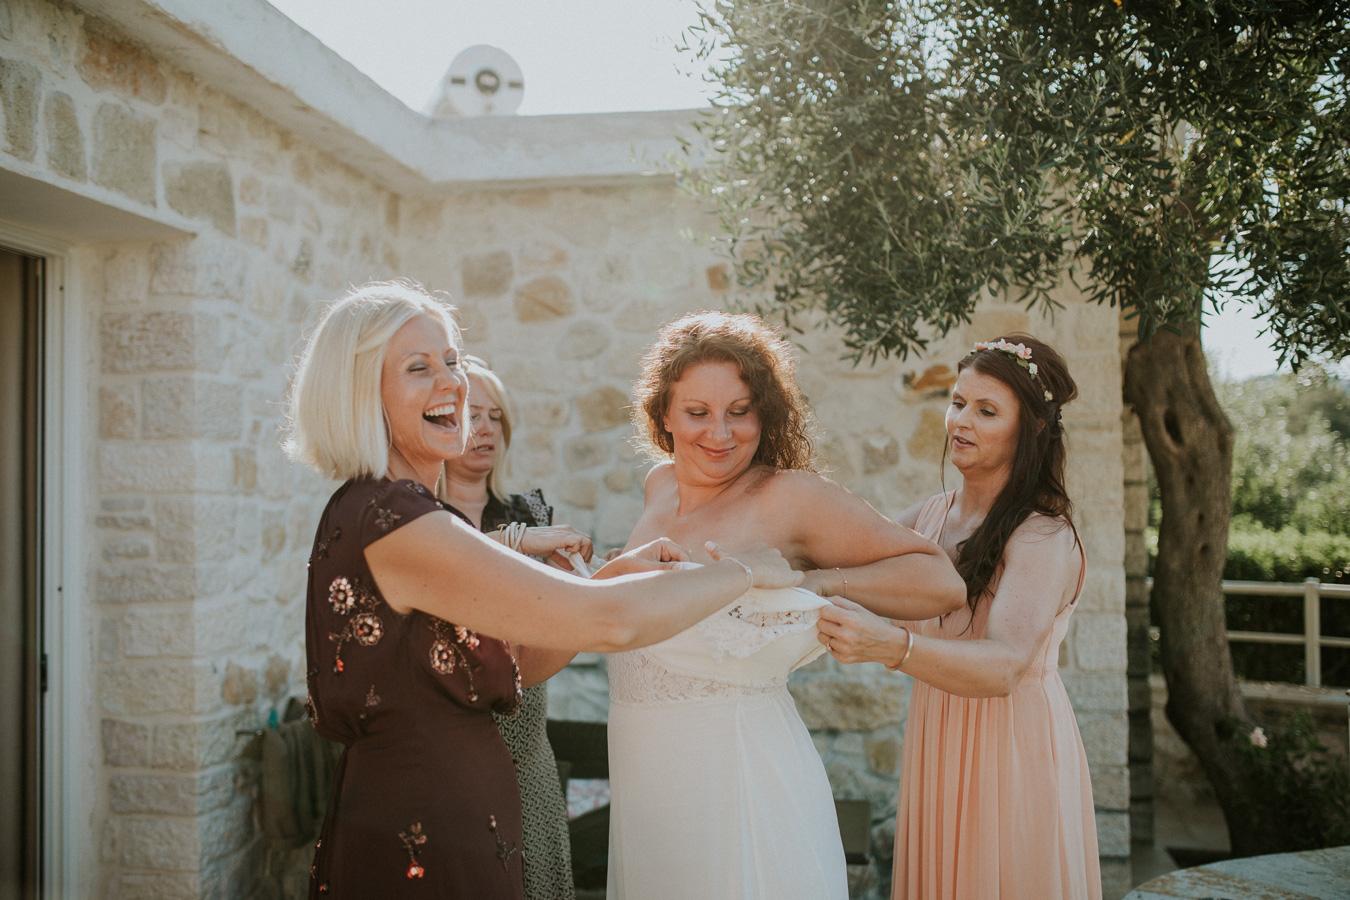 041-bryllupsfotograf-oslo-destinasjonsbryllup-fotograf-tone-tvedt.jpg